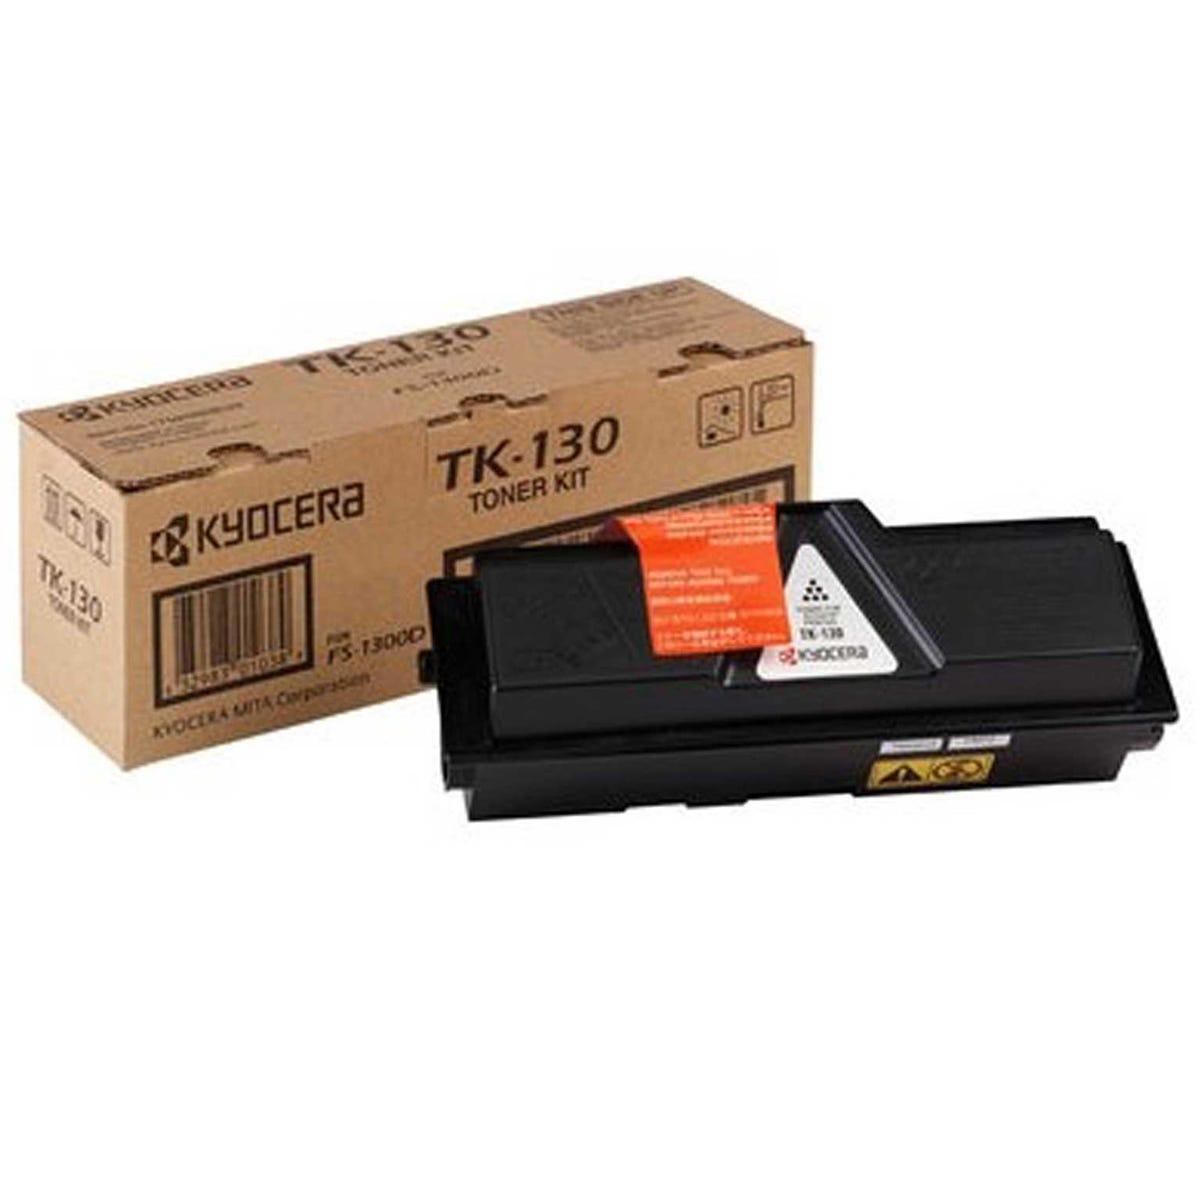 Image of Kyocera TK130 Printer Toner Cartridge, Black